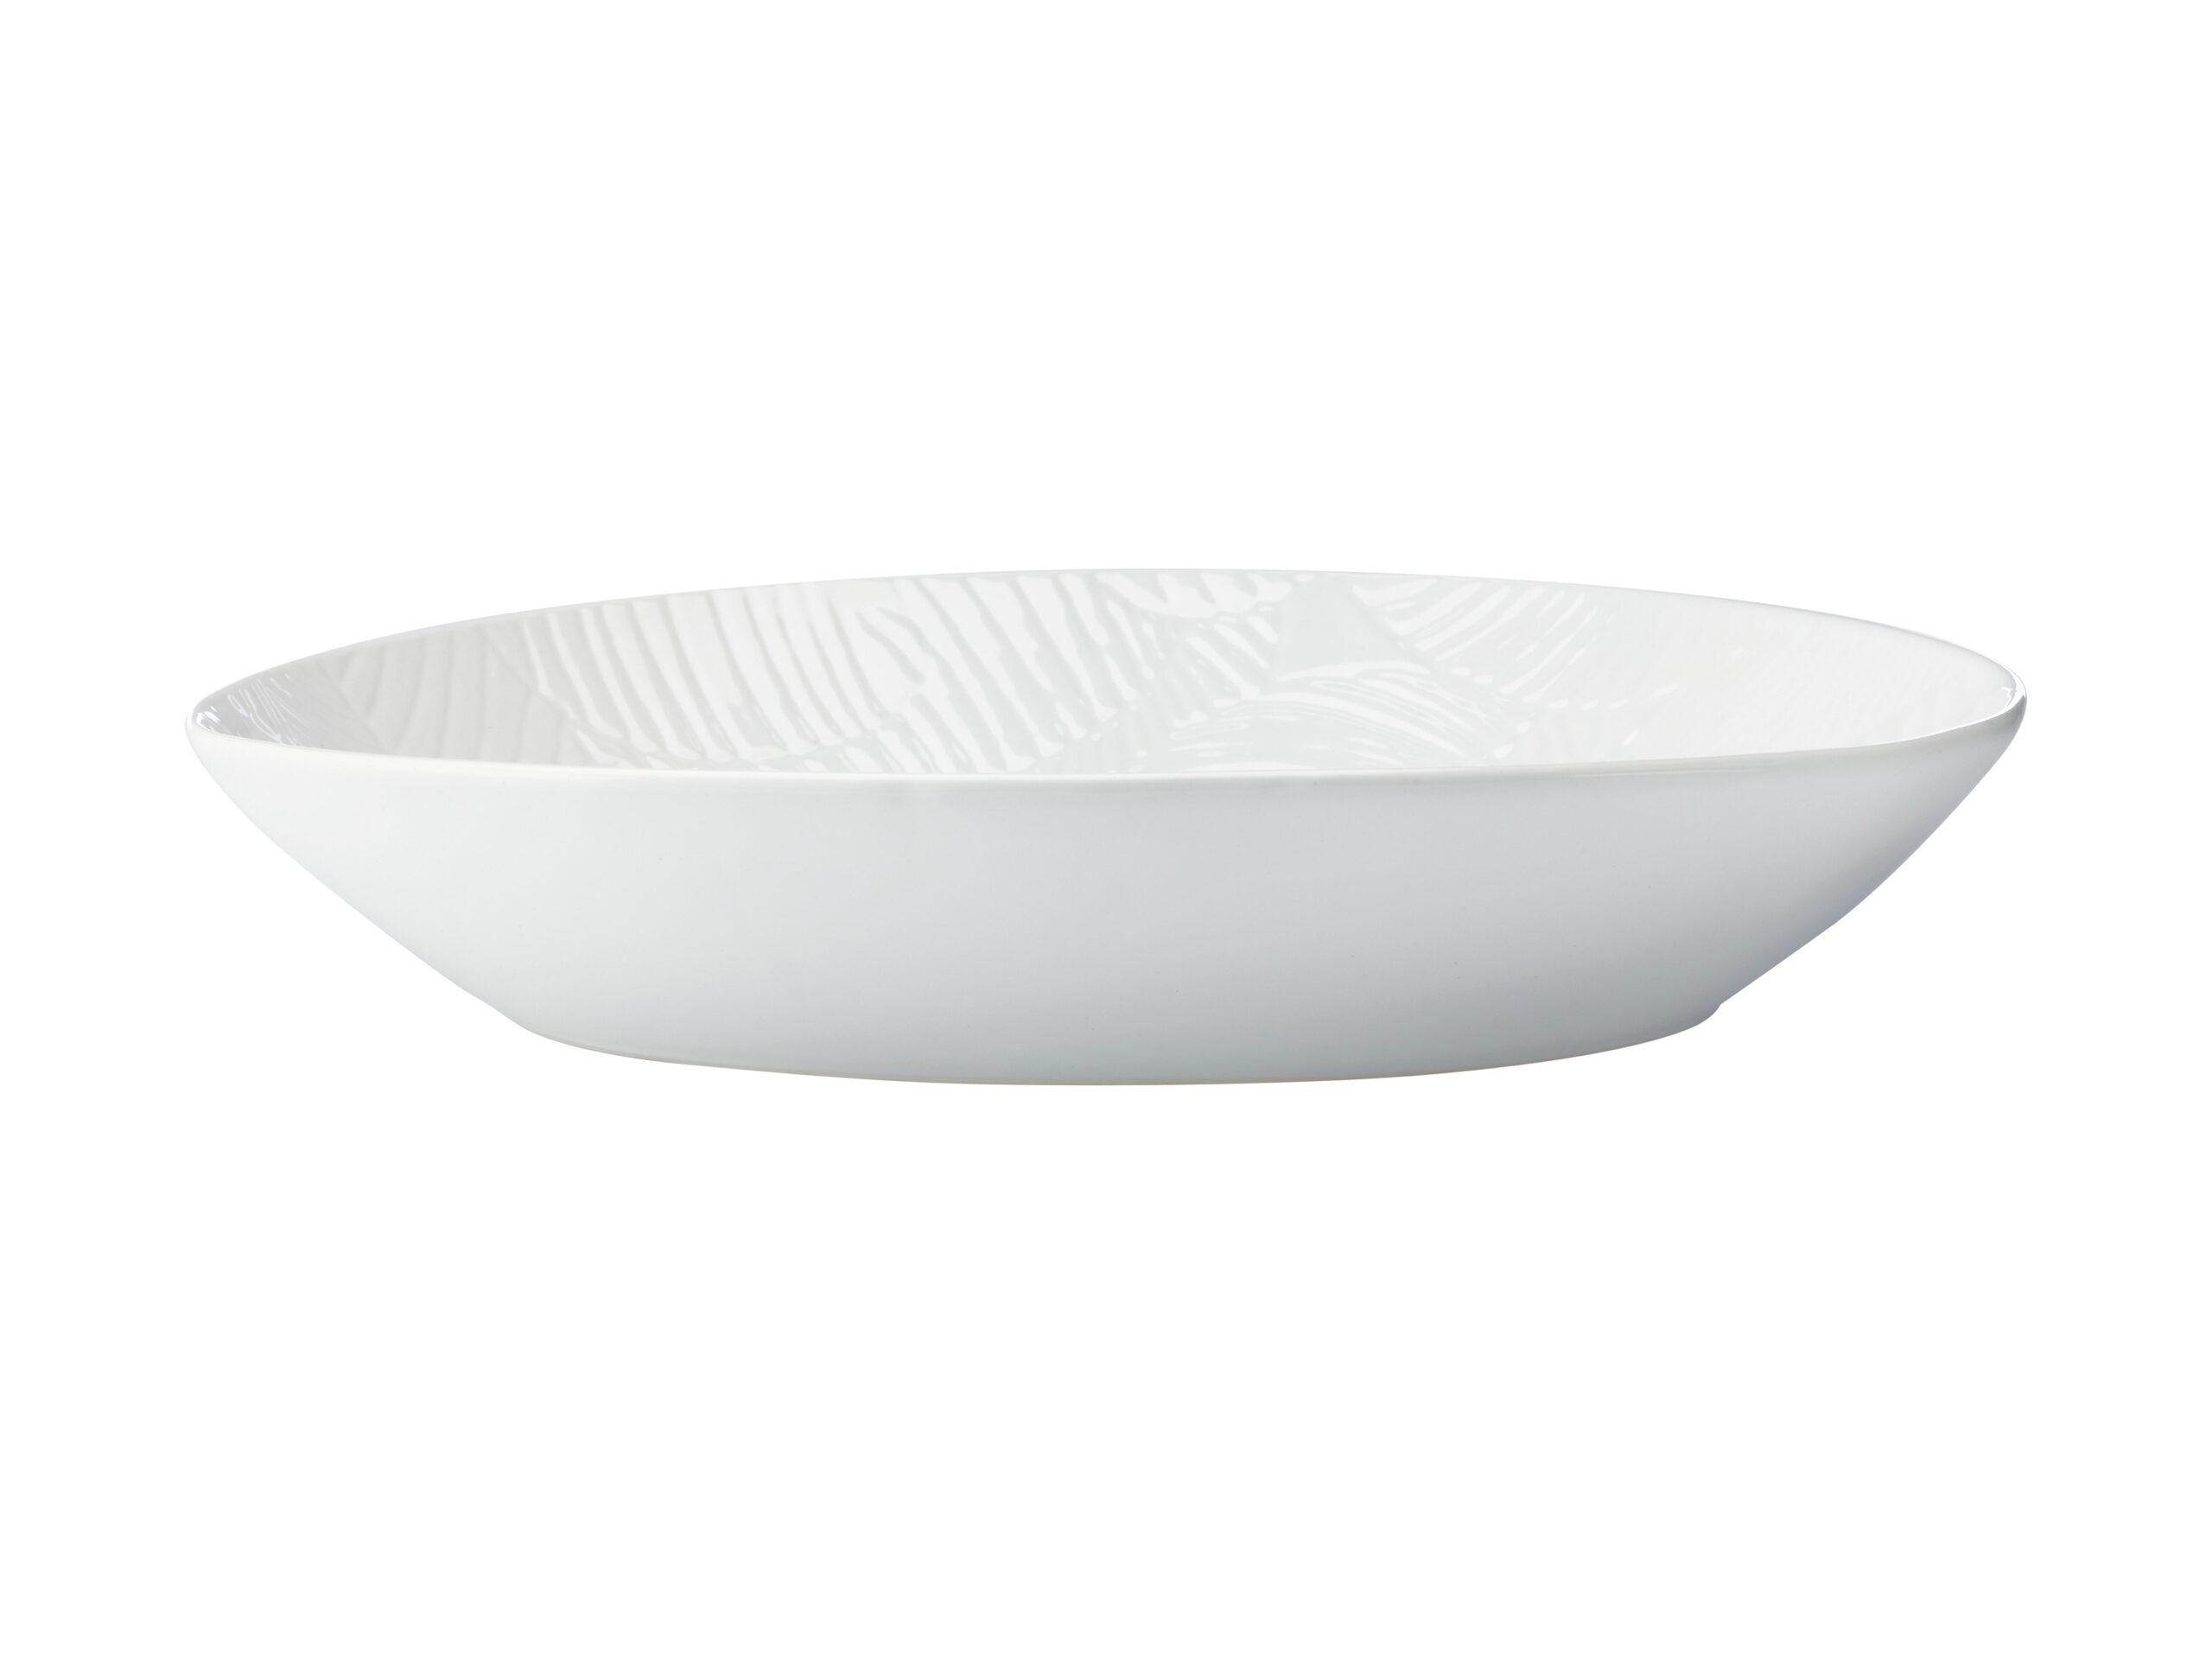 Maxwell Williams Panama Oval Bowl White 32x23cm